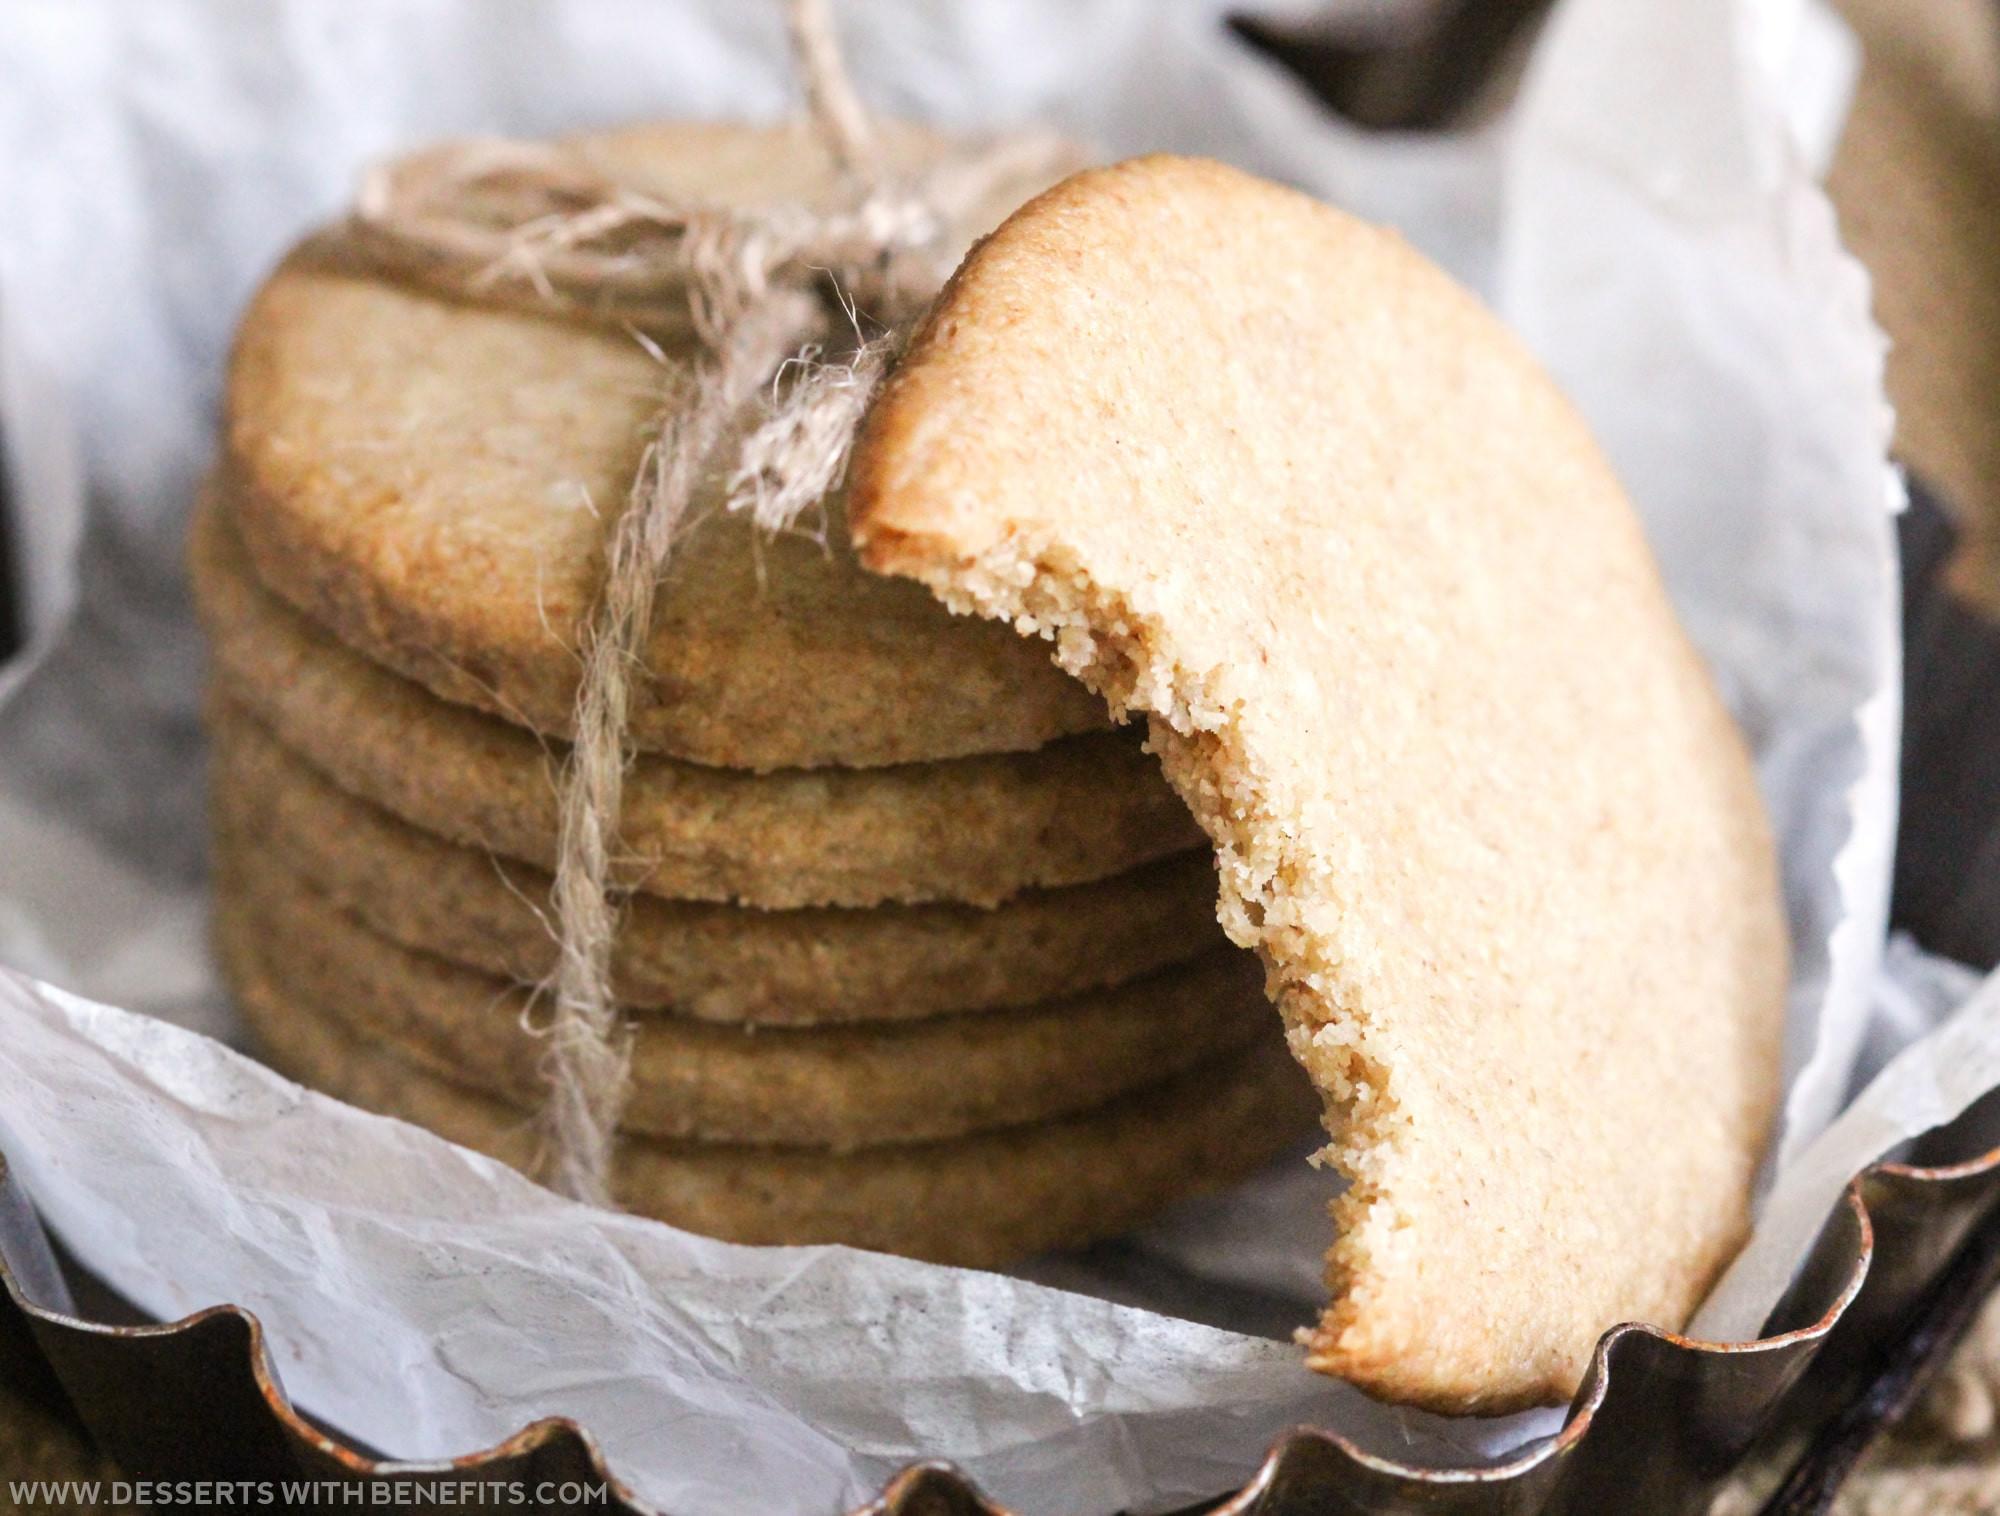 Sugar Free Dairy Free Desserts  Desserts With Benefits Healthy Shortbread Cookies recipe